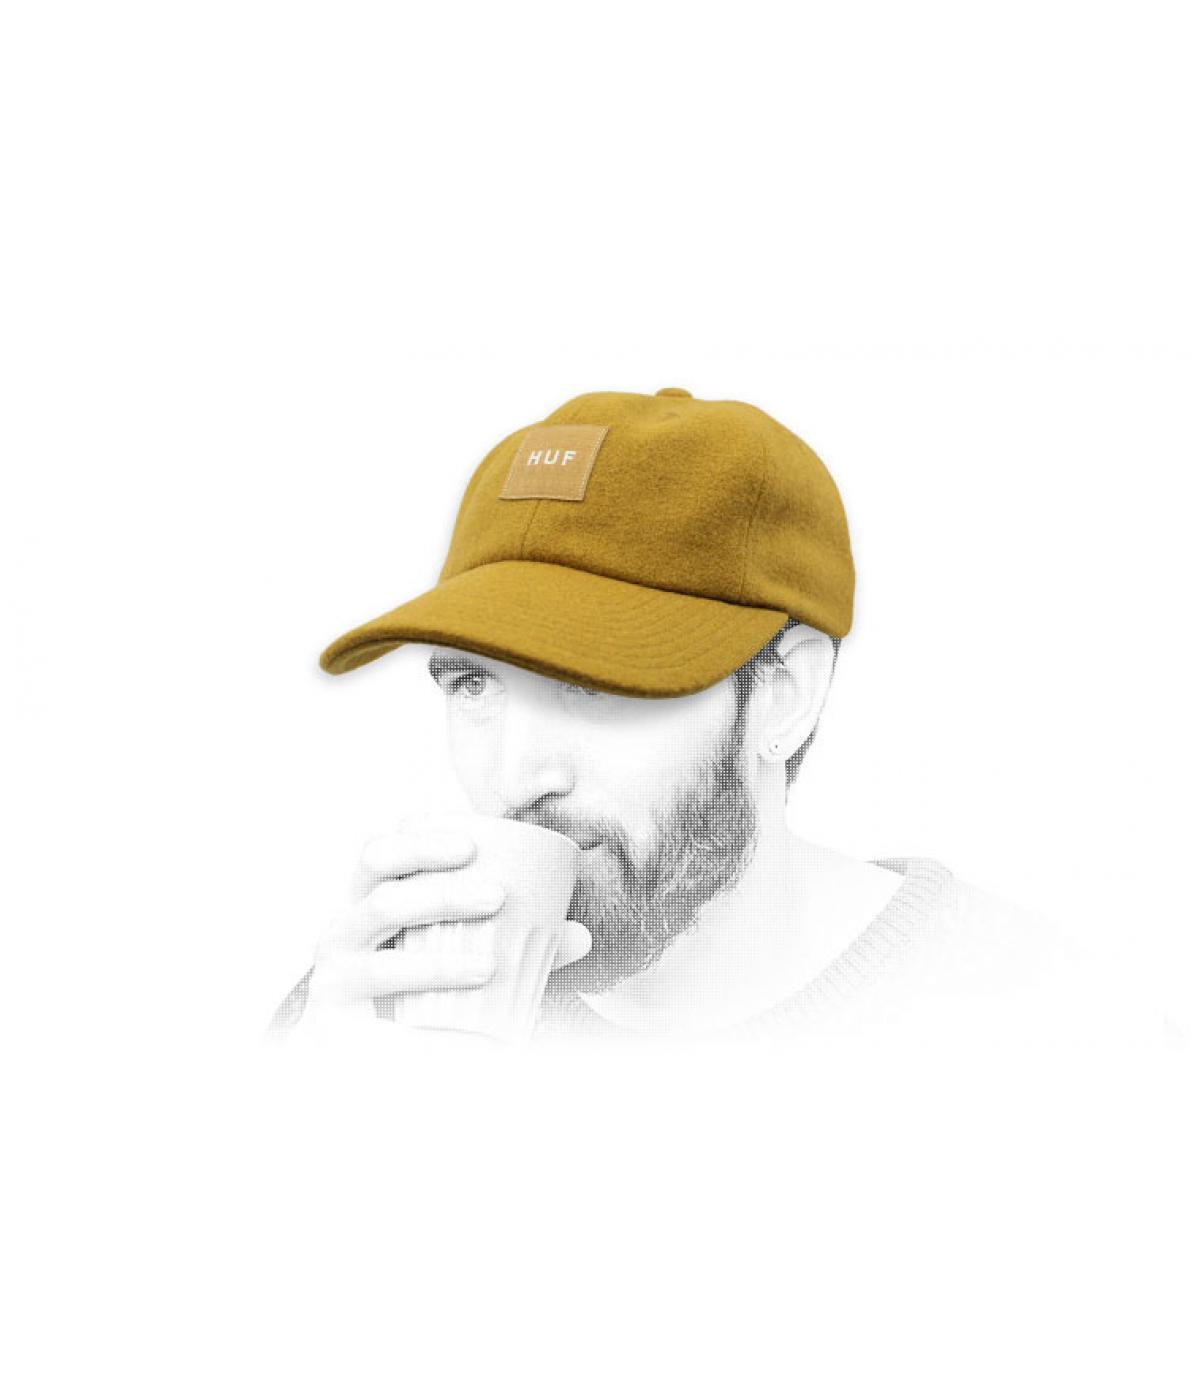 Wollen muts Melton Huf geel